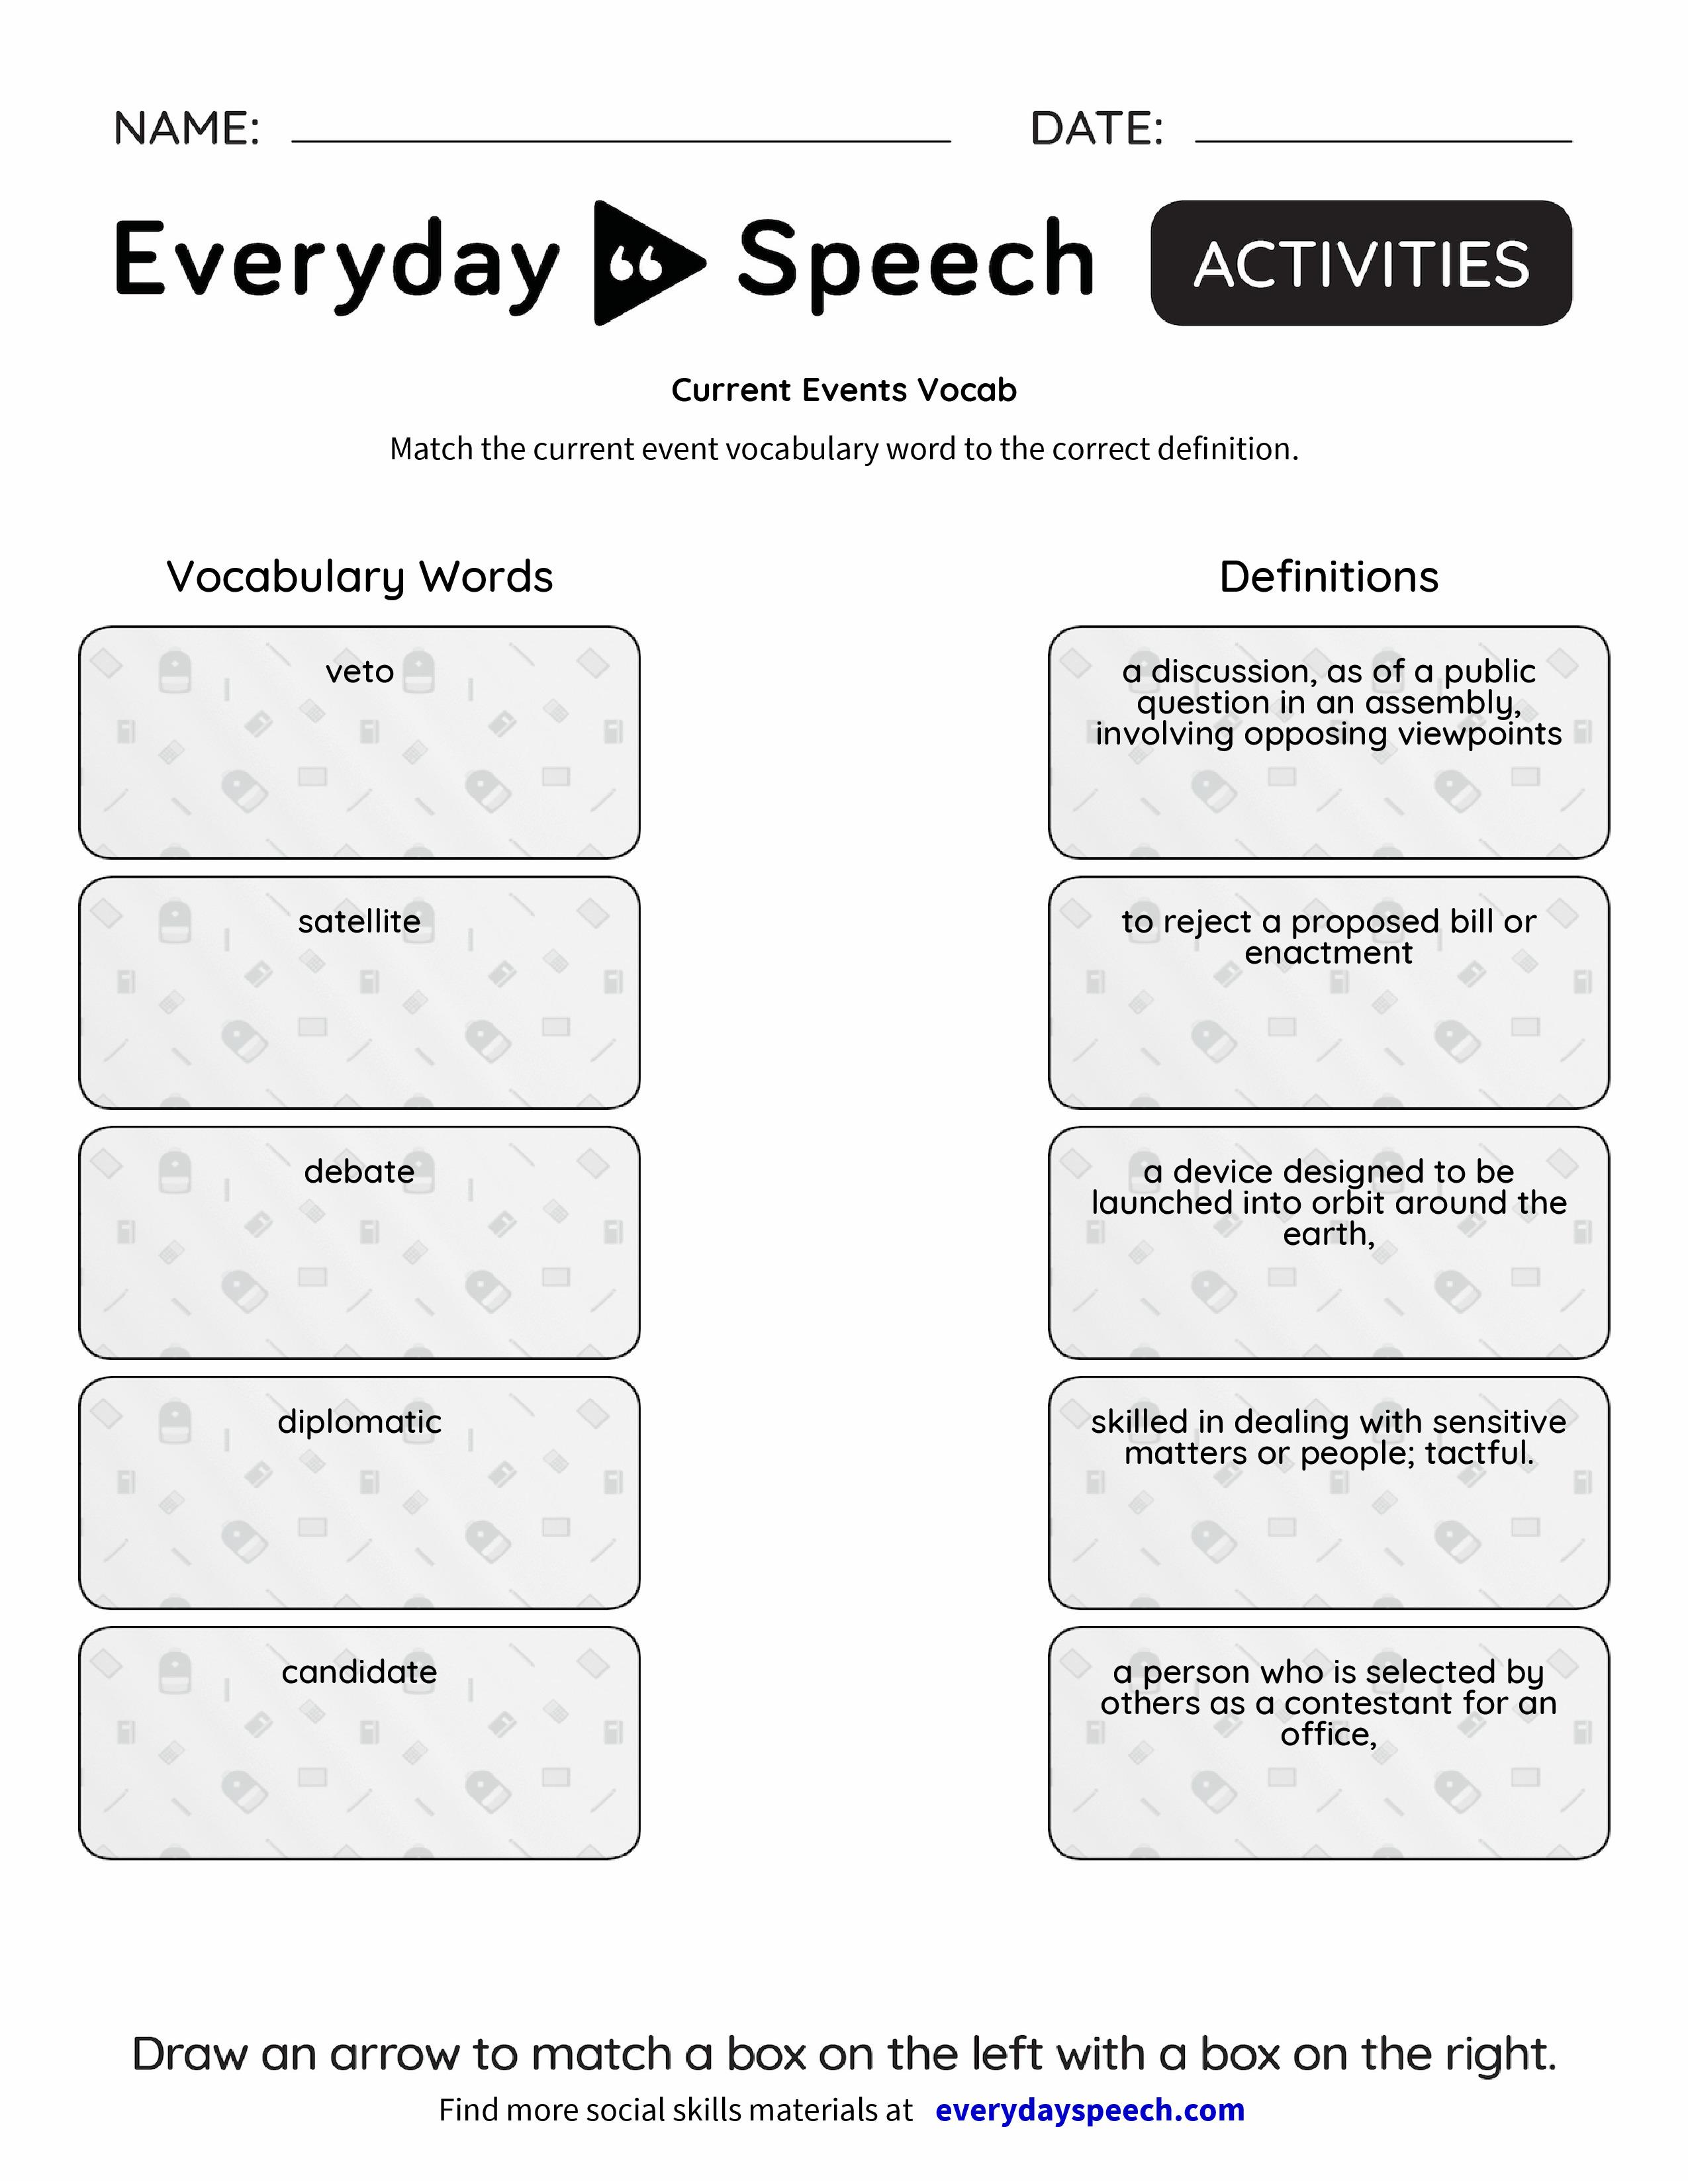 Current Events Vocab Everyday Speech Everyday Speech